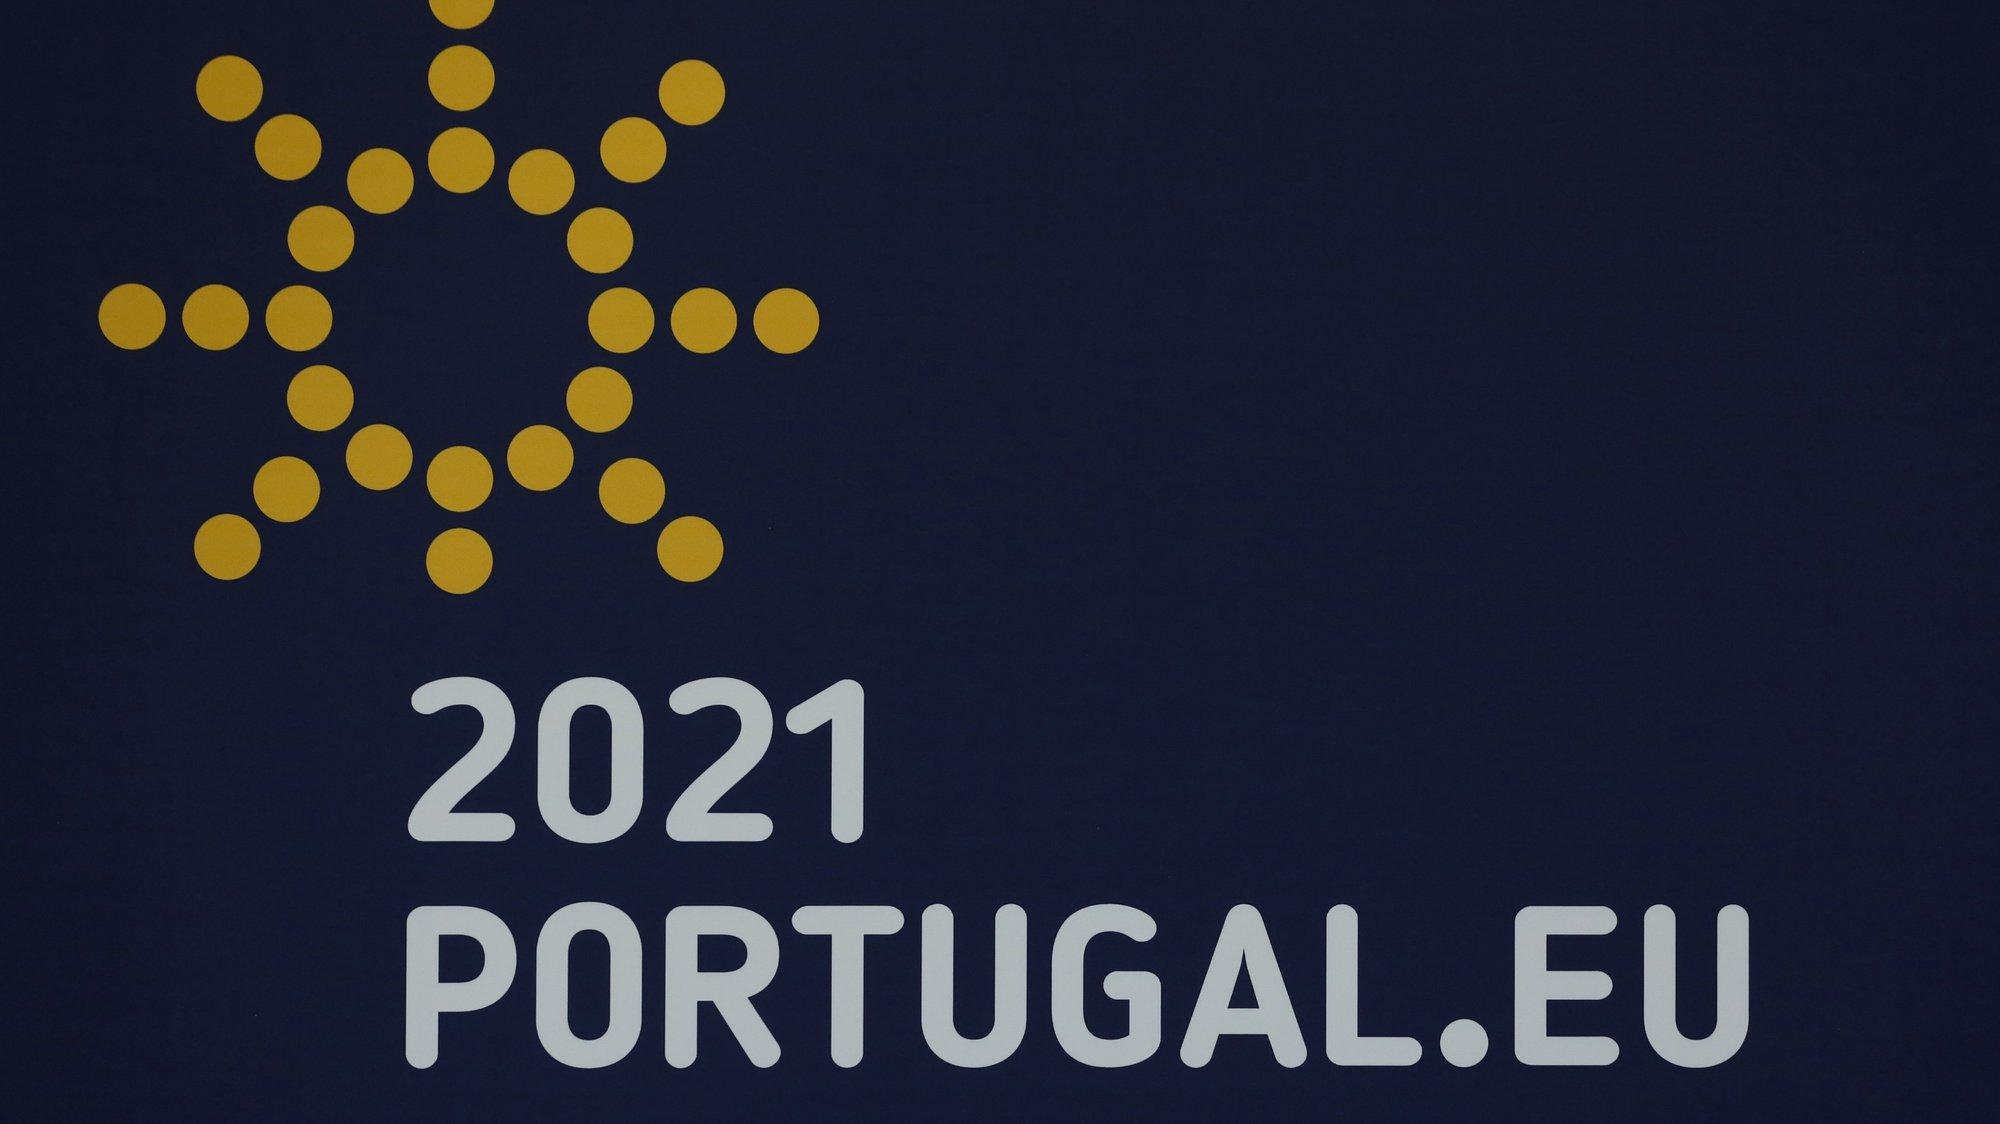 Logotipo da presidência portuguesa da União Europeia, Lisboa, 30 de dezembro de 2020. ANTÓNIO COTRIM/LUSA